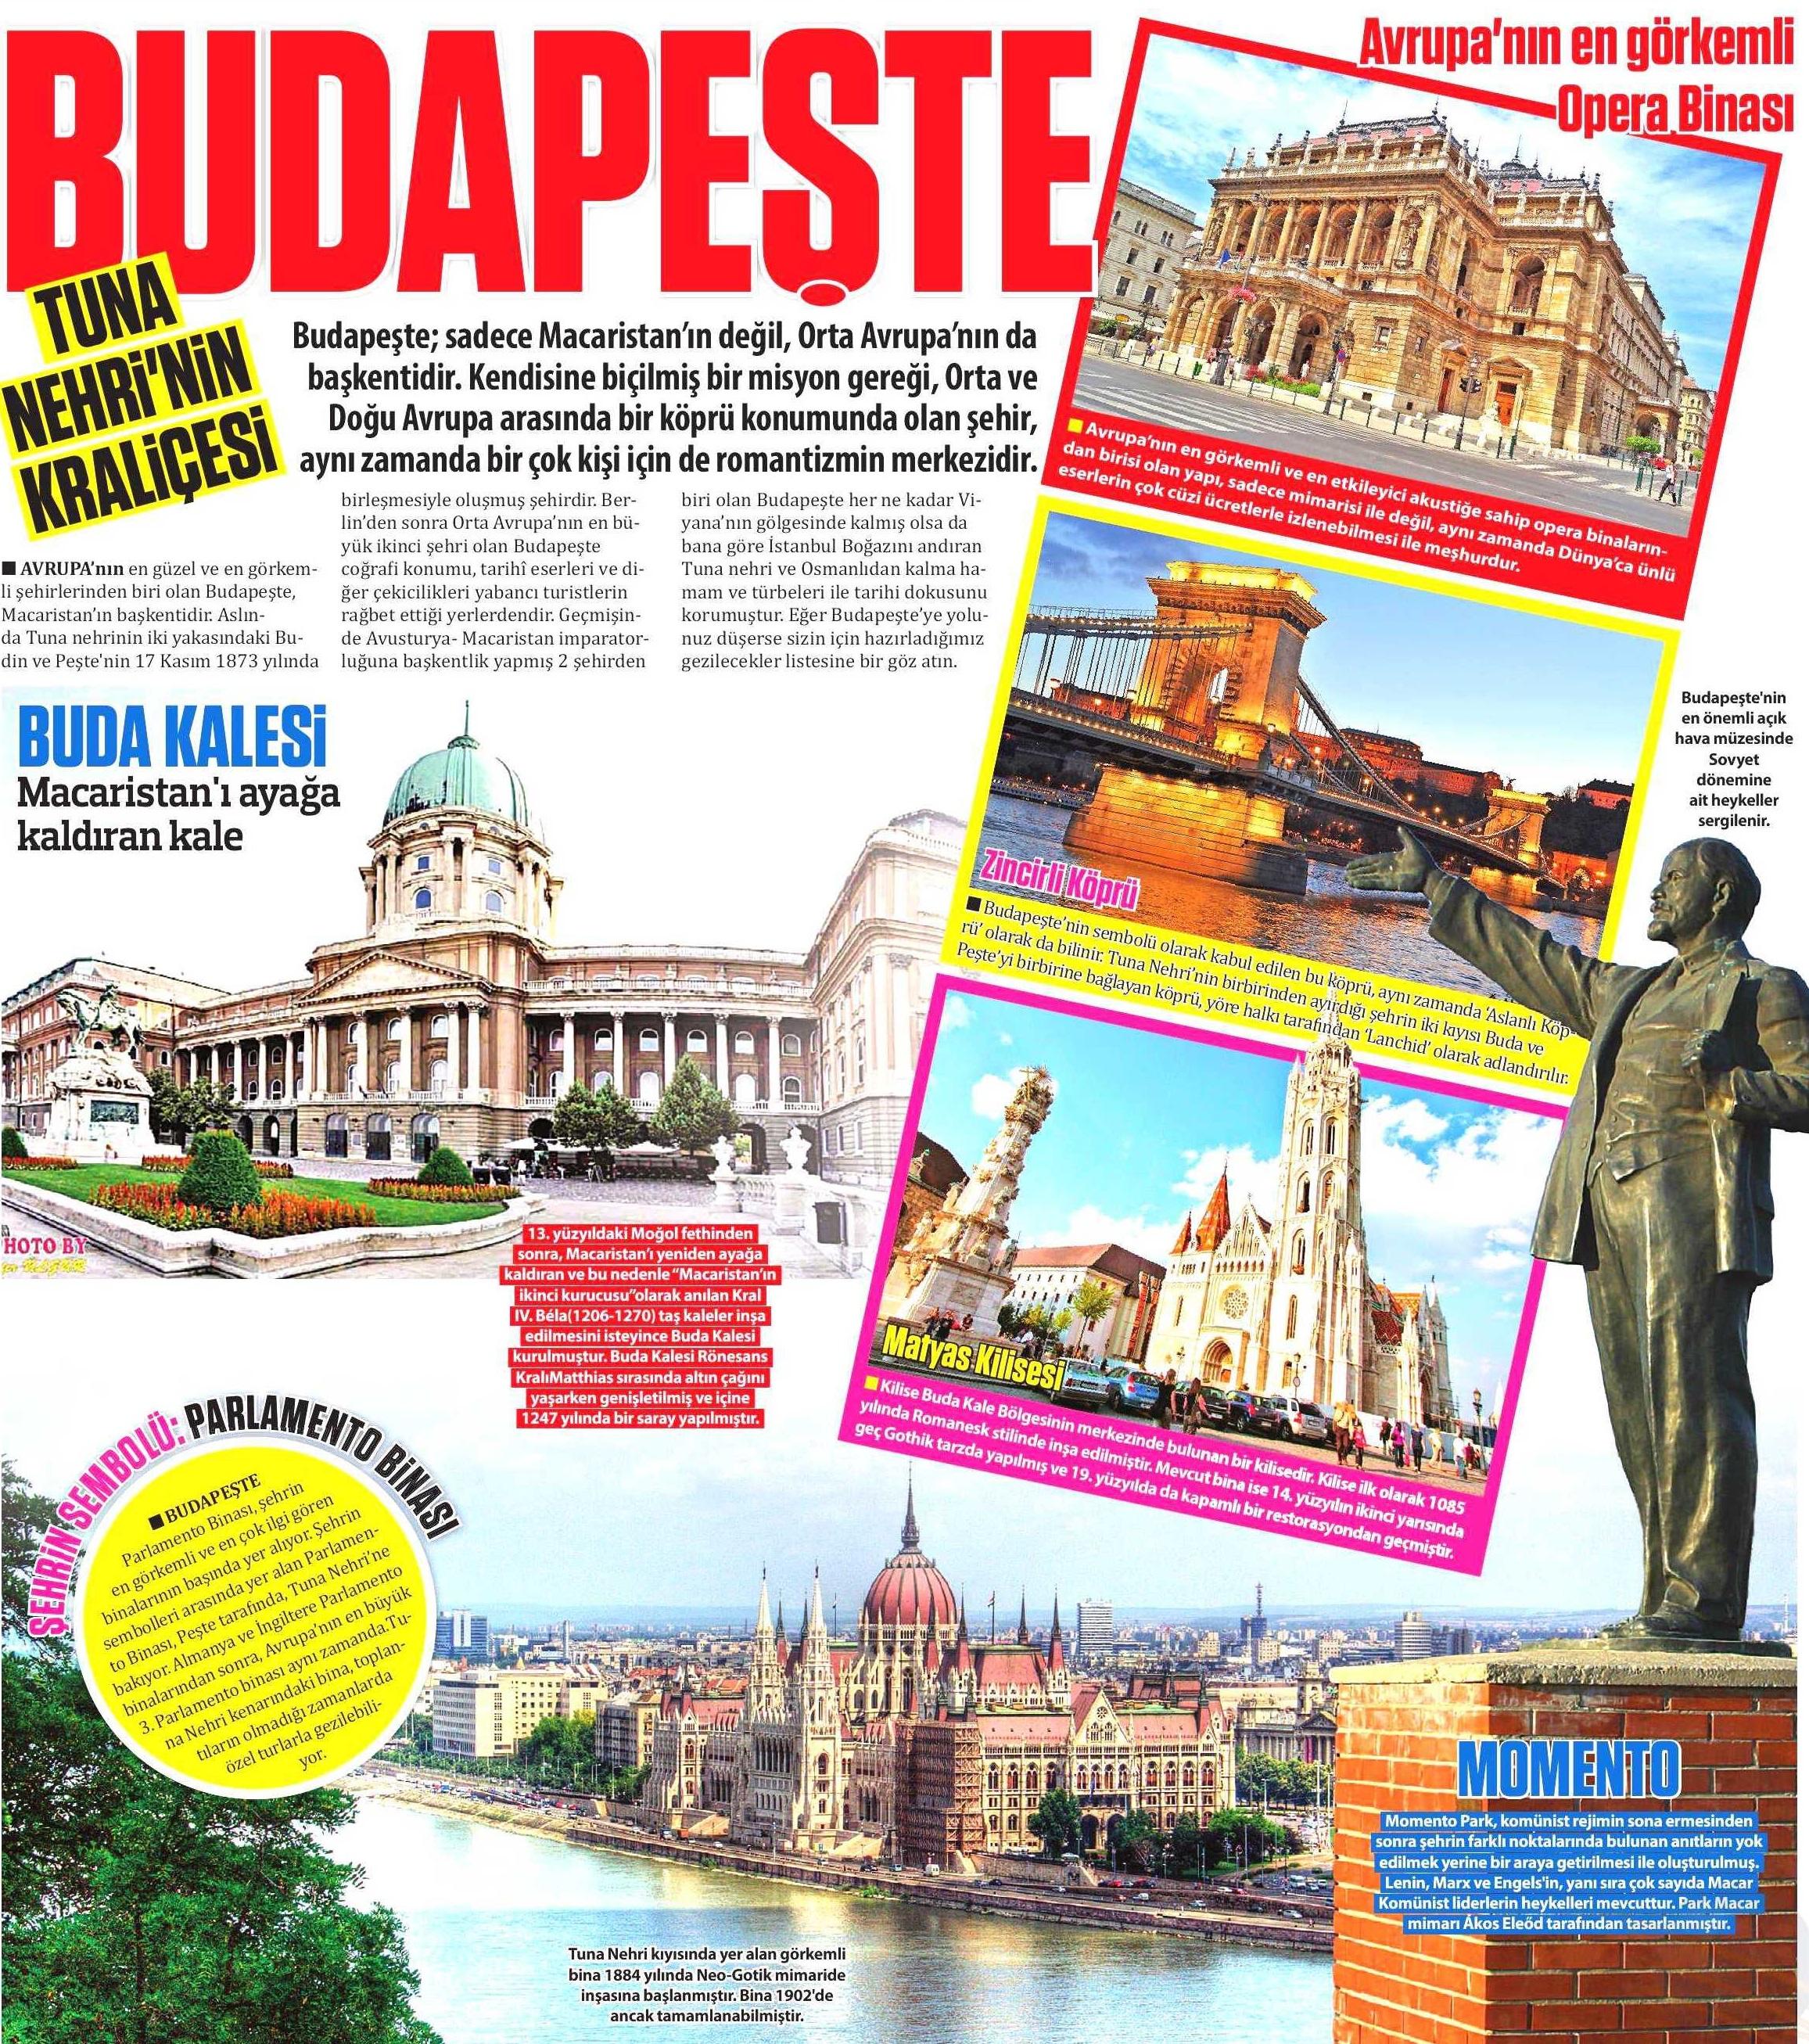 günes gazetesi 2015 11 19 budapest